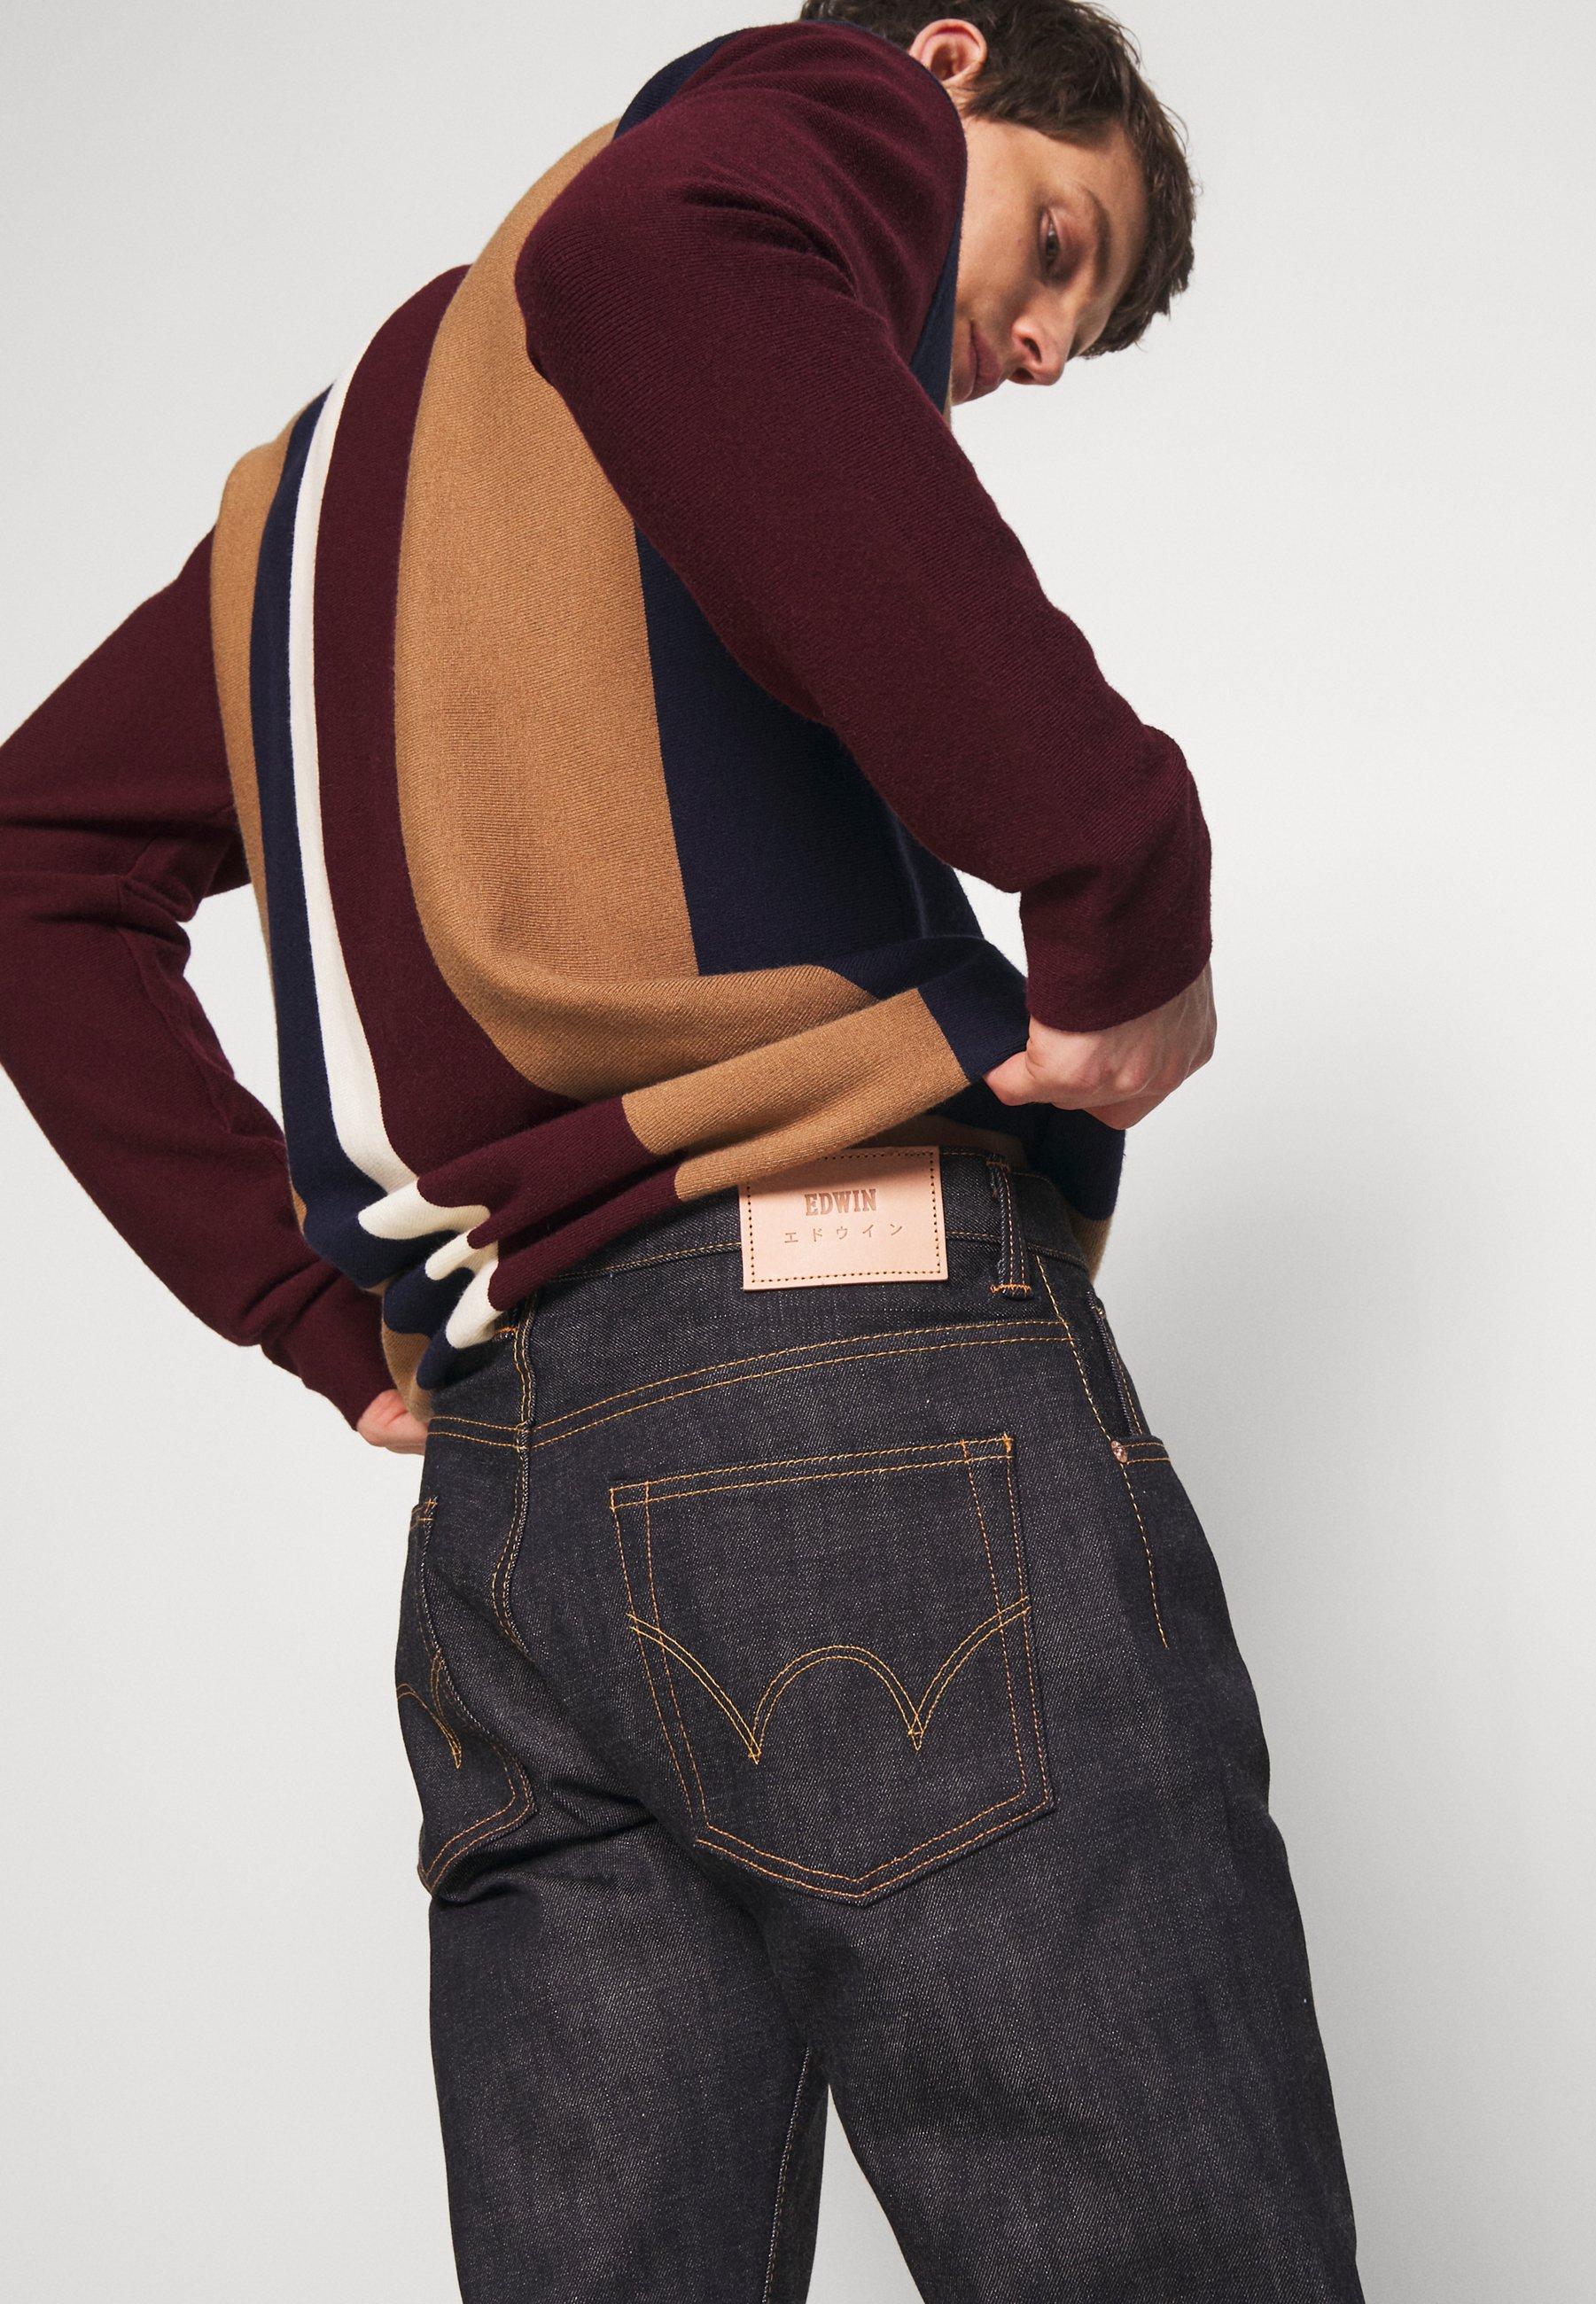 Edwin Jeans Straight Leg - Raw Statenihon Menpu / Dark Pure Indigo Rainbow Selvage